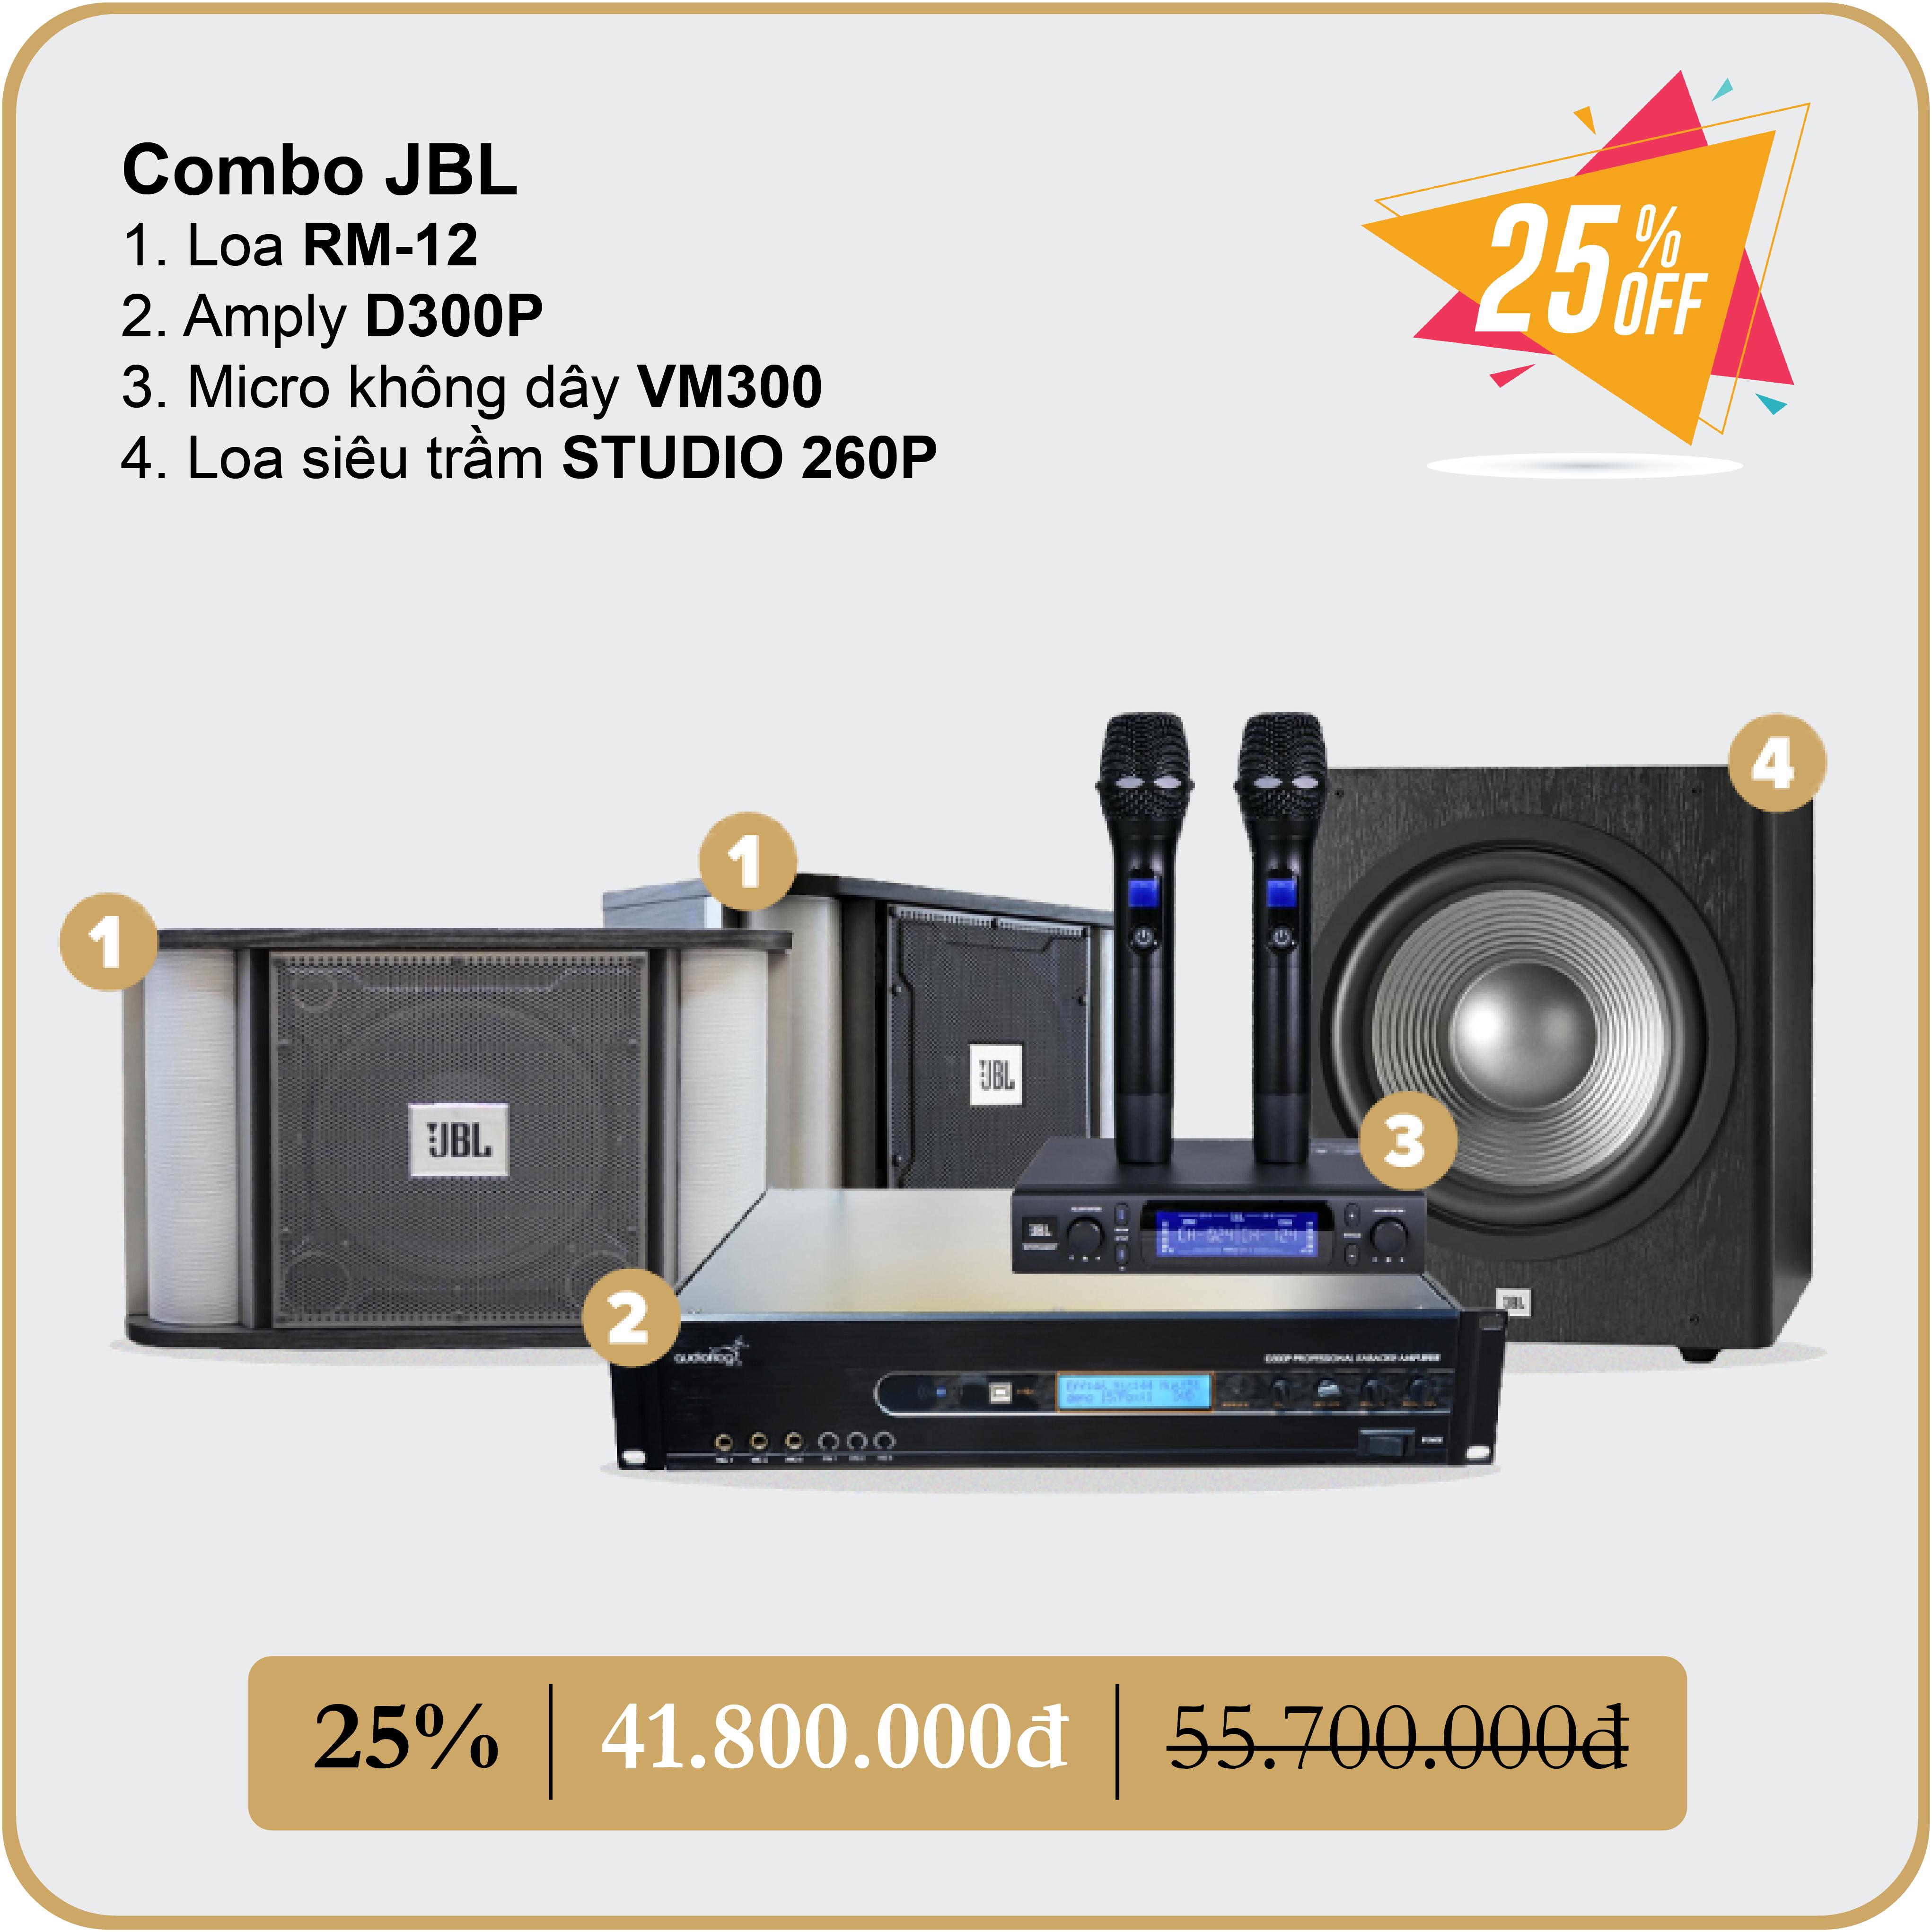 COMBO JBL 3